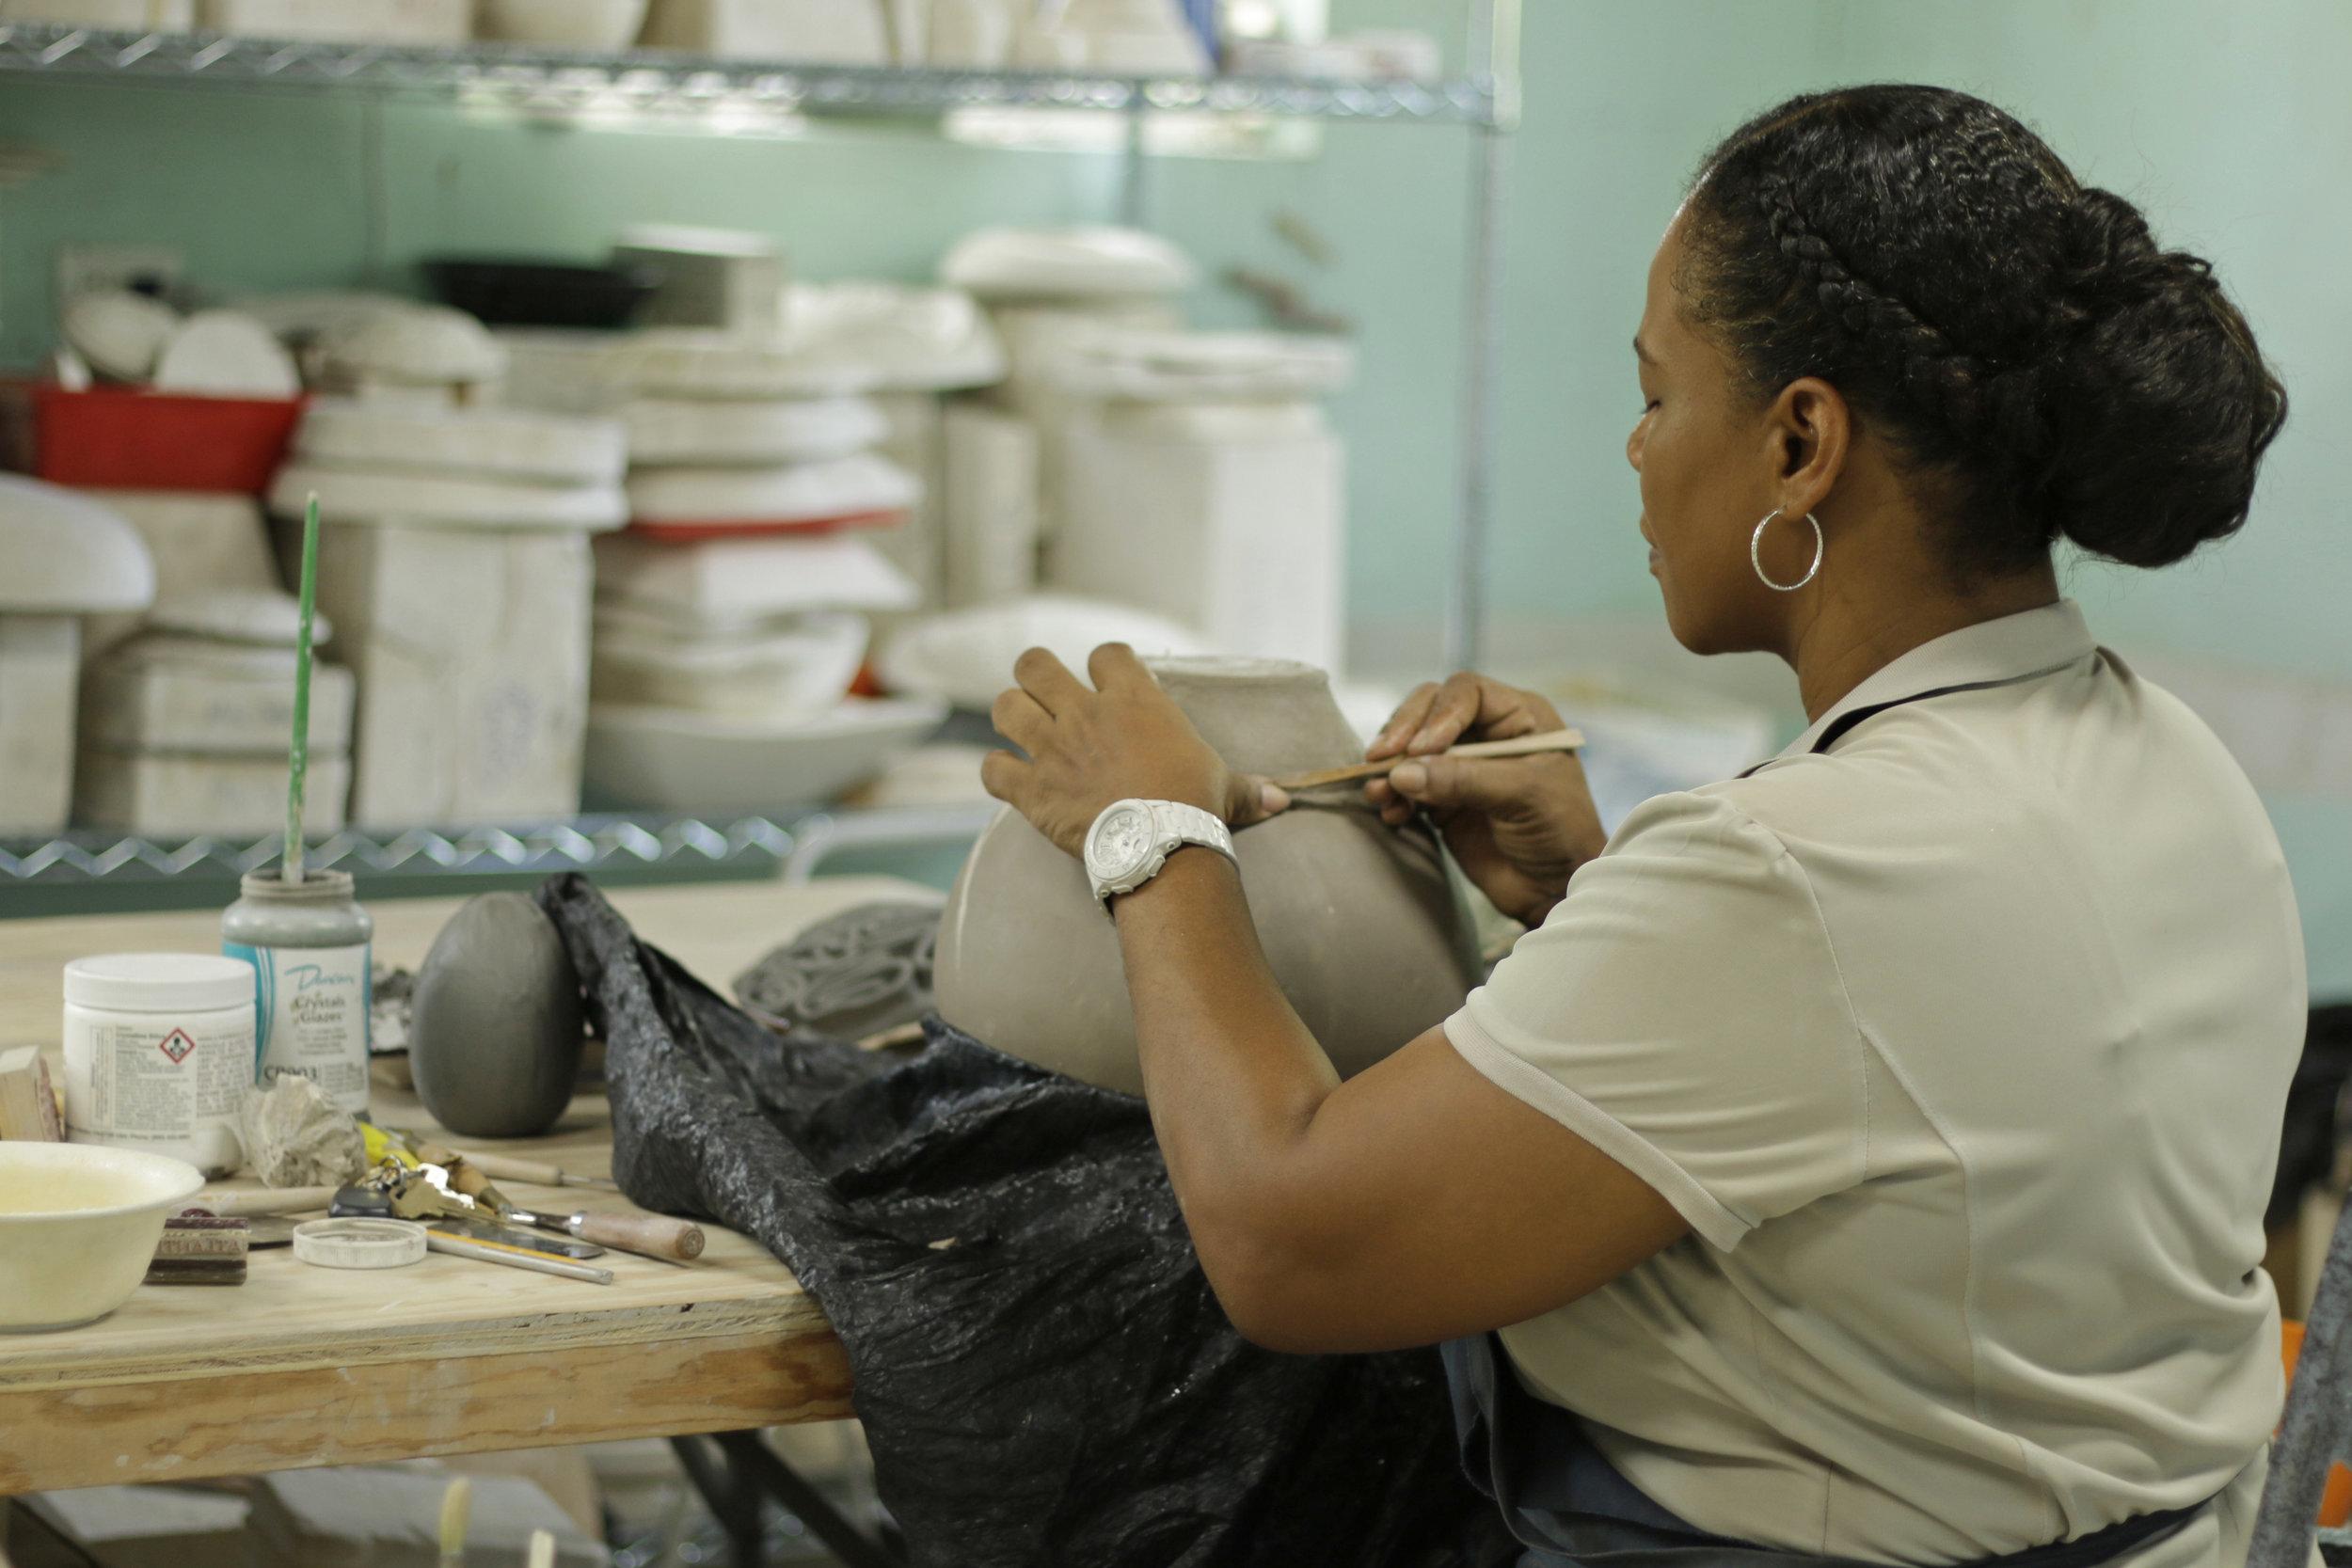 Jessica Colebrooke working in her ceramics studio (Jessica's Tileworks Studio in Gleniston Park, Nassau, The Bahamas. (Photo by Keisha Oliver)